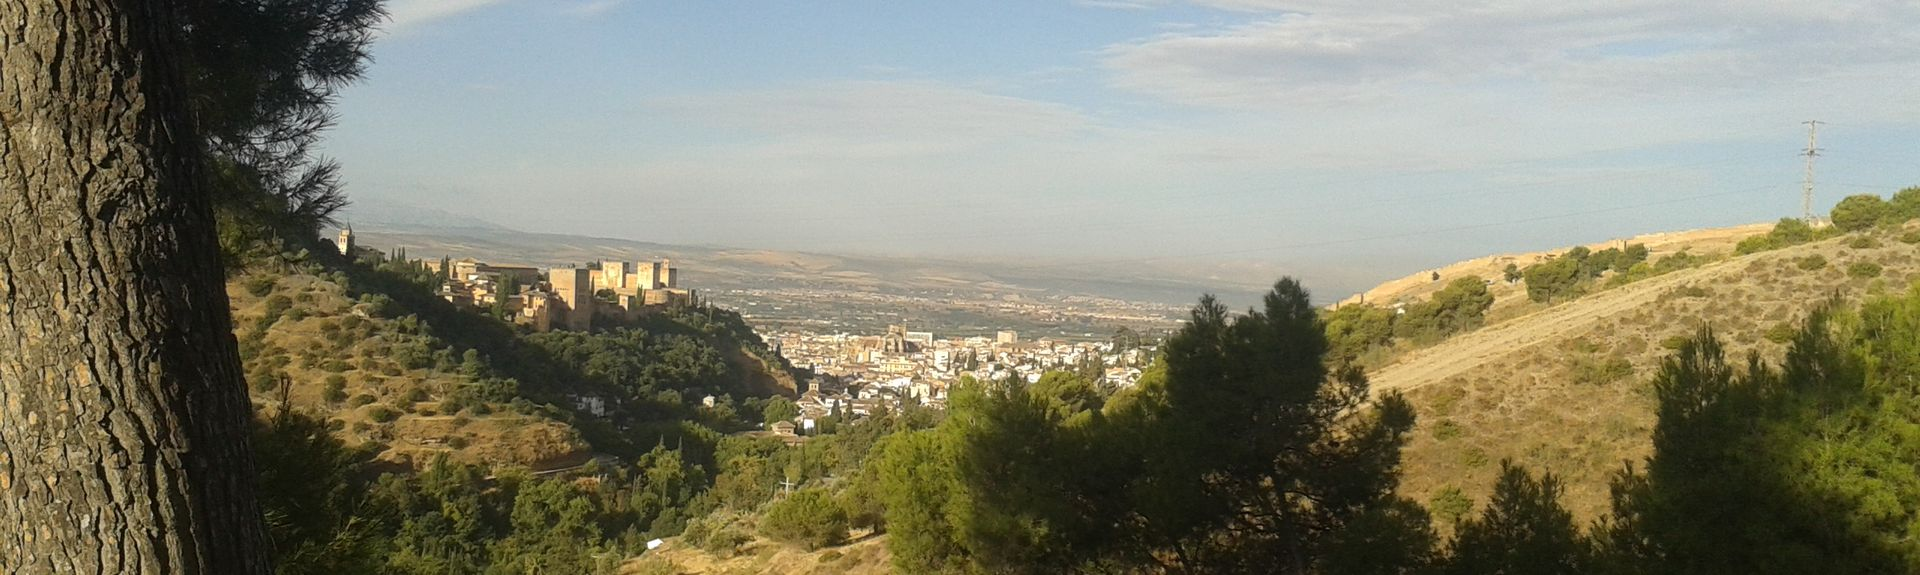 Chana, Granada, Granada, Spain